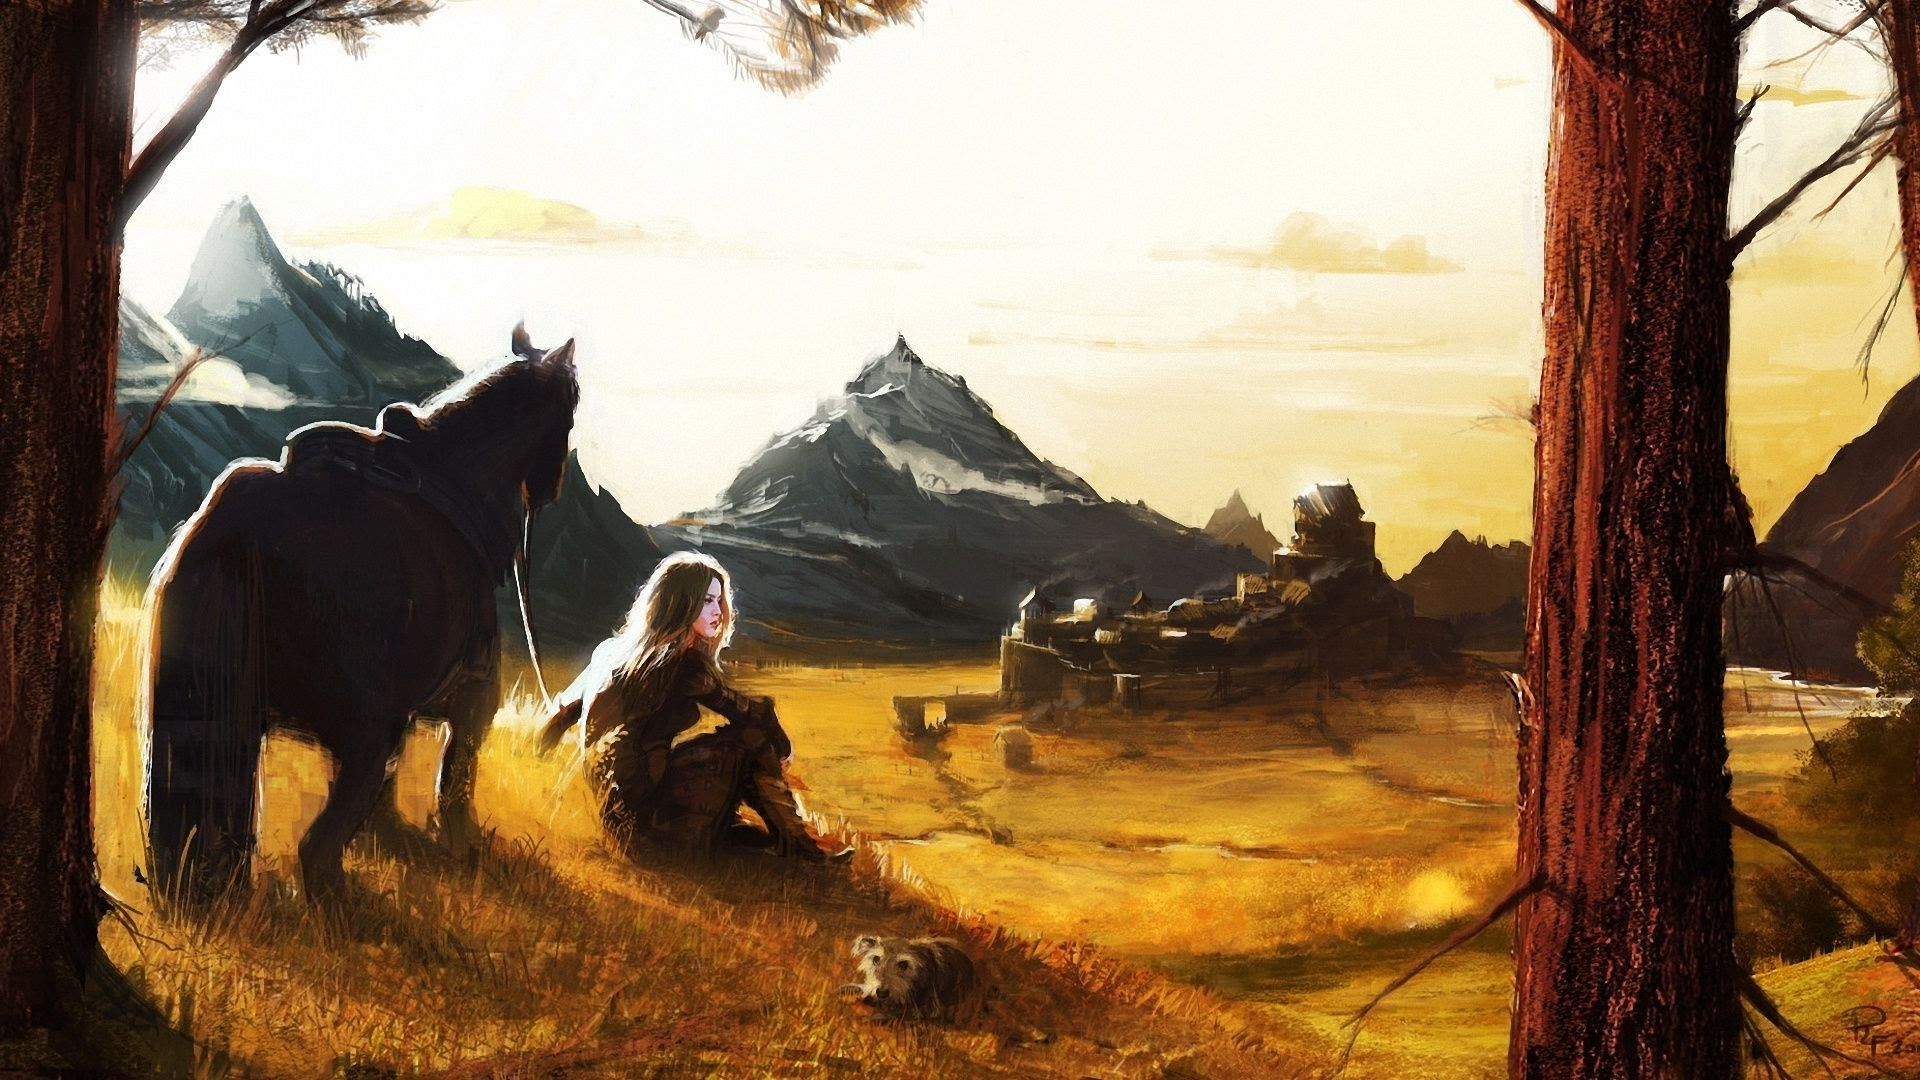 Good Wallpaper Horse Epic - c02ab29c8cf59549ae706f177334db3a  Gallery_206632.jpg